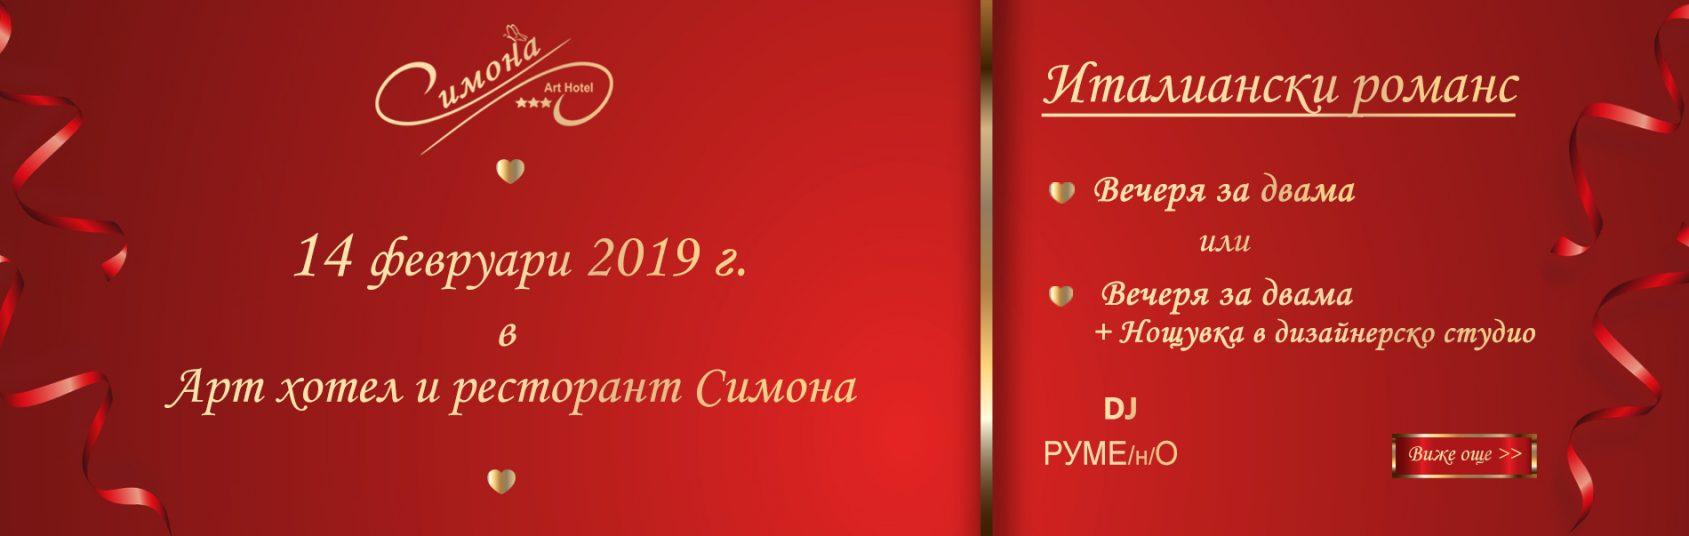 Свети Валентин 2019 в Арт хотел и ресторант Симона, София